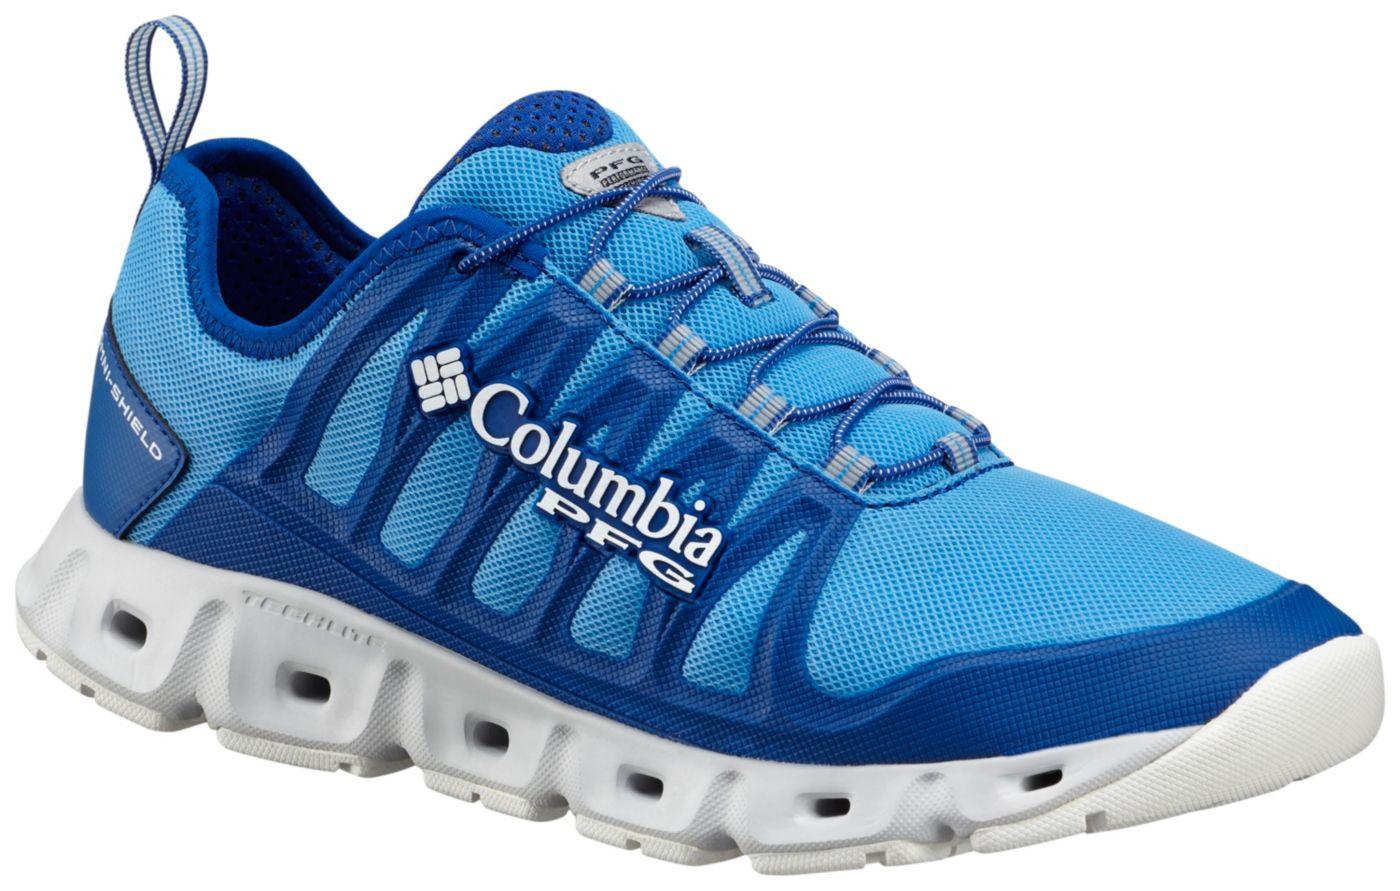 Columbia Men's PFG Megavent II Fishing Shoes